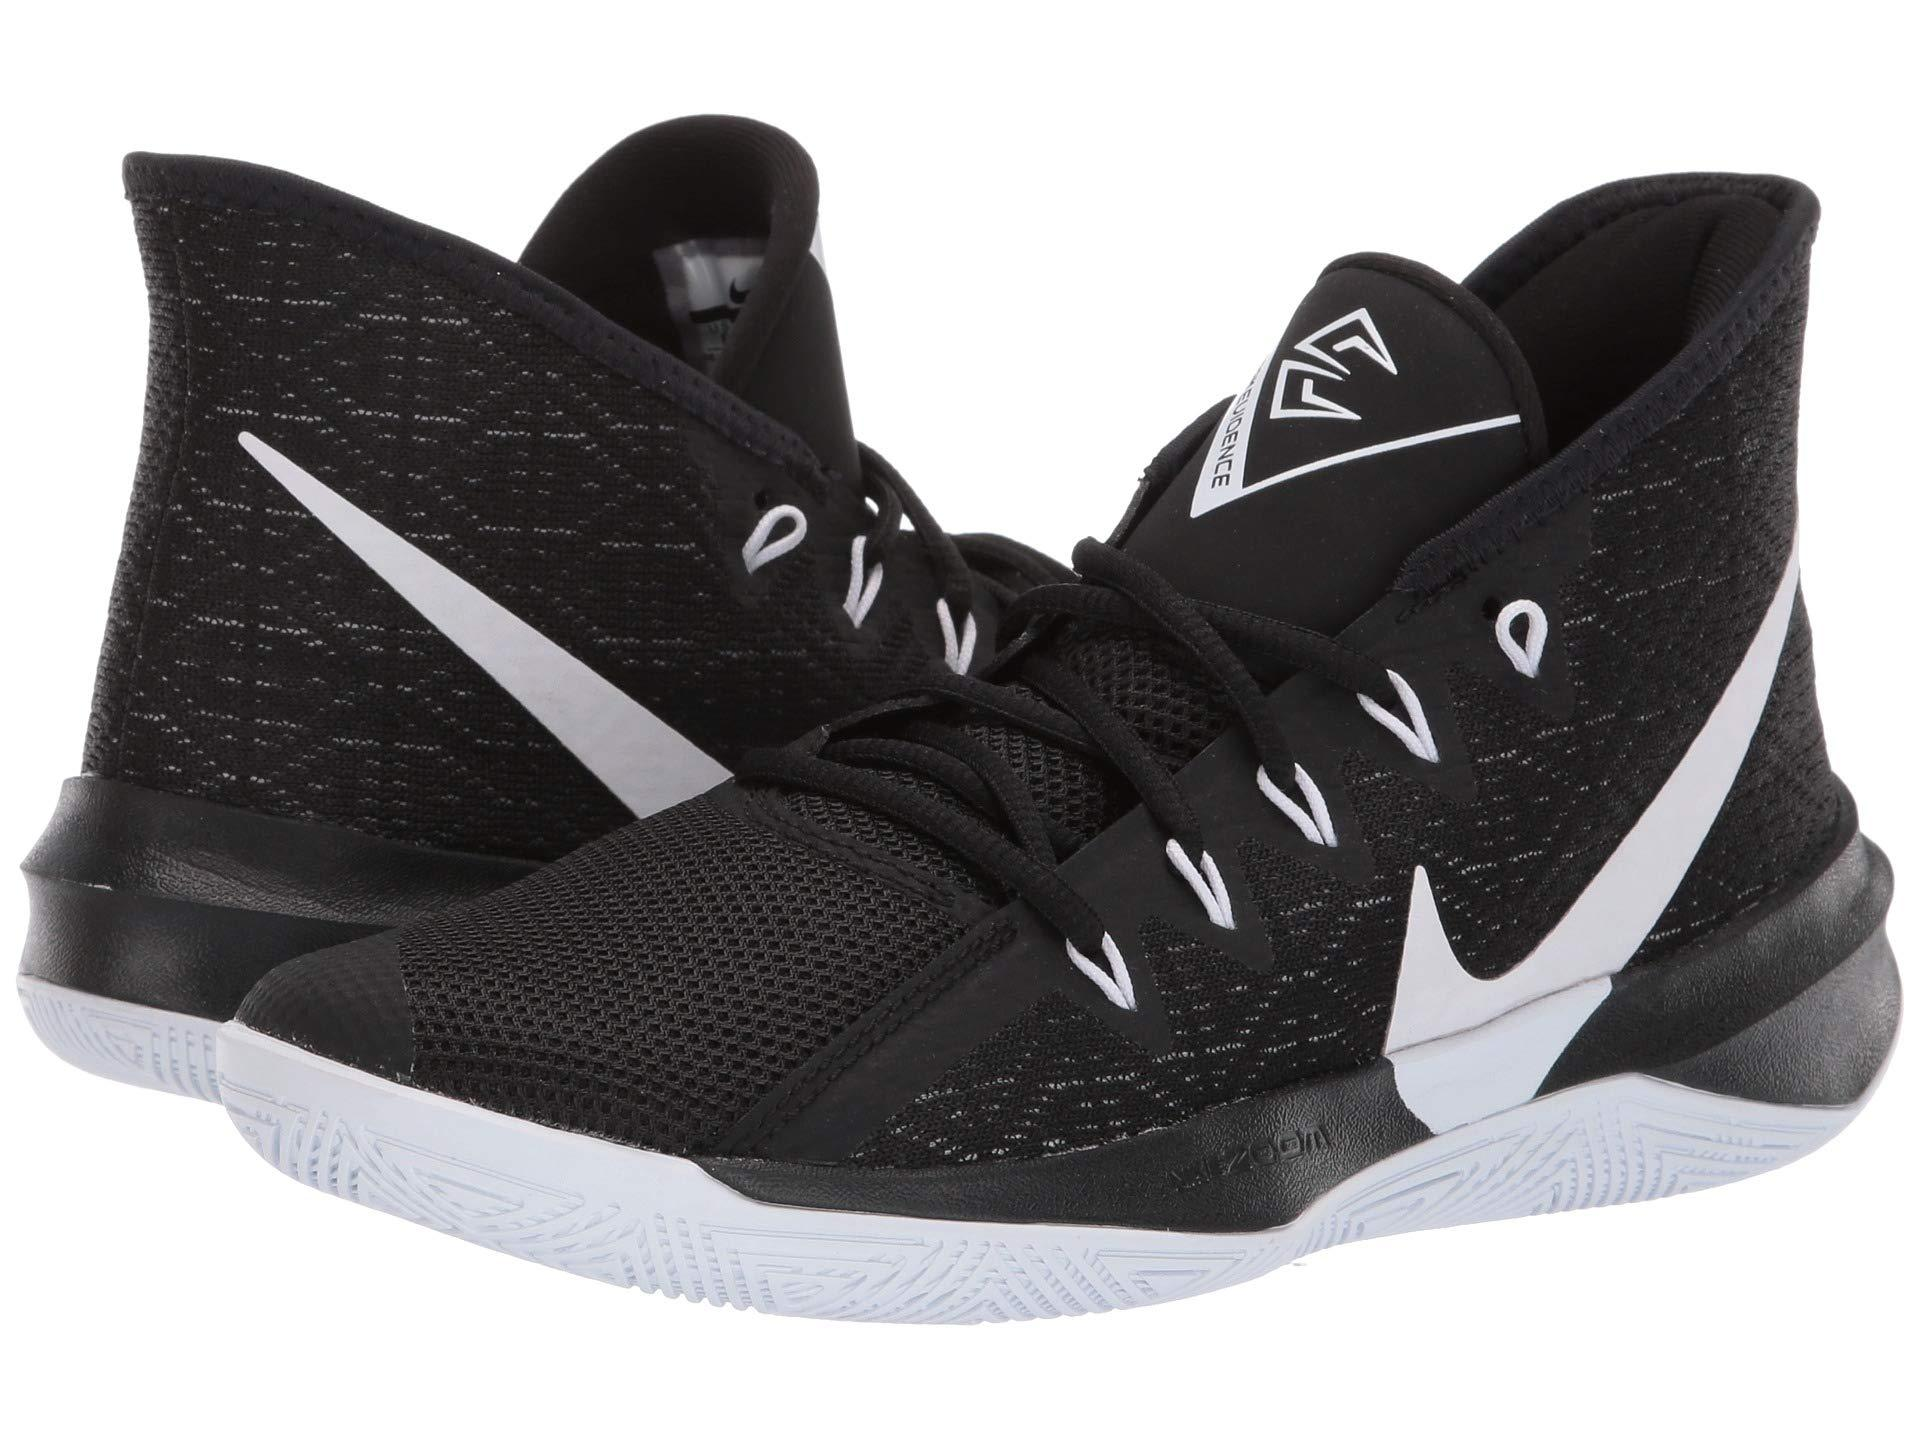 75276fba6124ed Nike. Zoom Evidence Iii (black university Red white) Men s Basketball Shoes